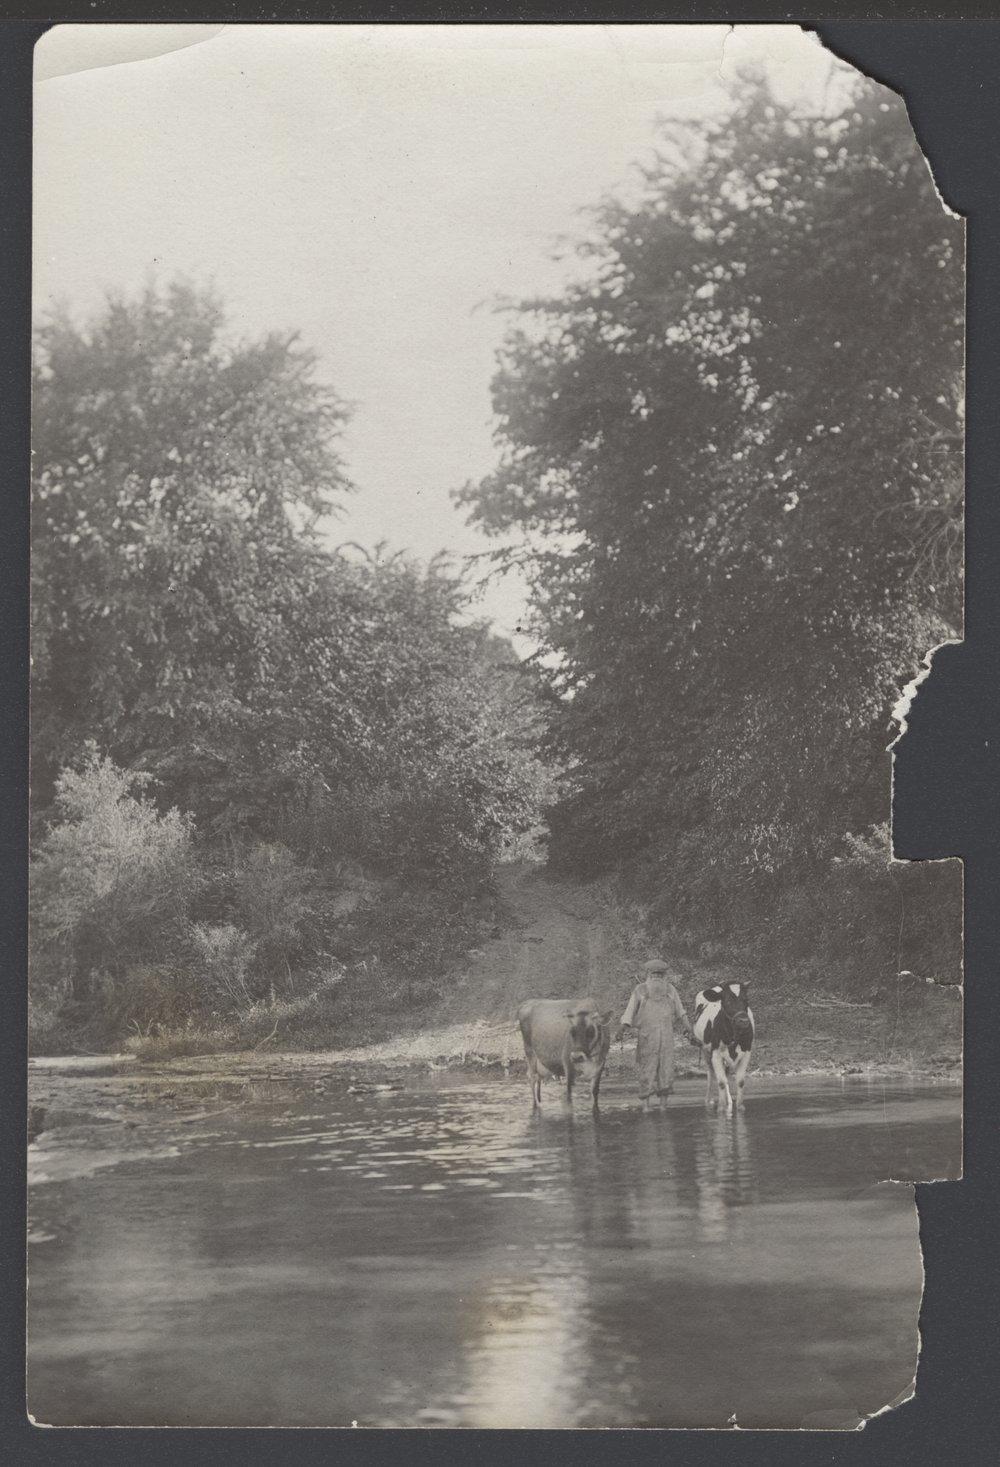 Old military crossing, Louisville, Kansas - 3